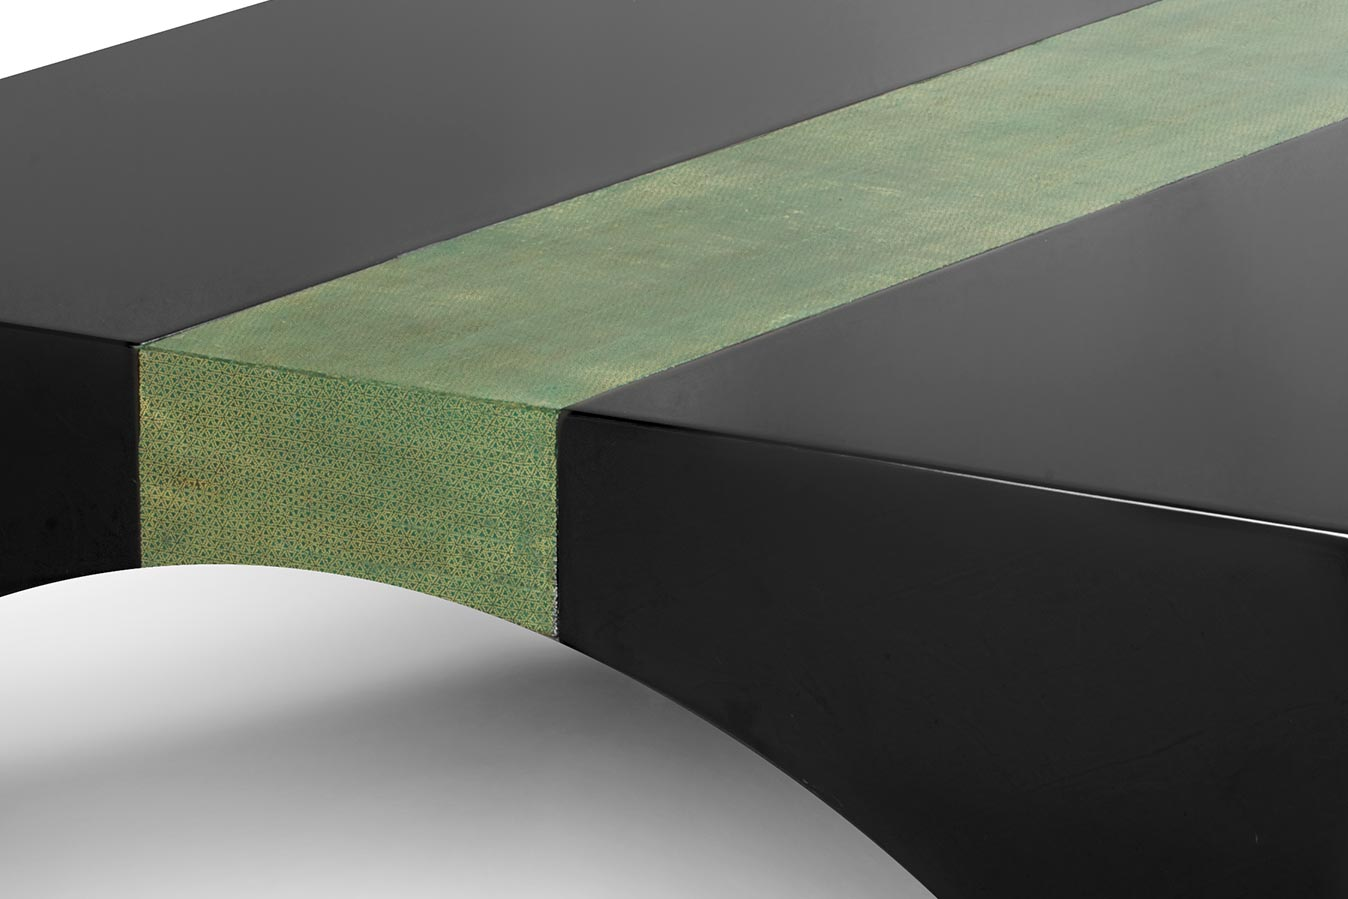 golnar-low-square-table-2